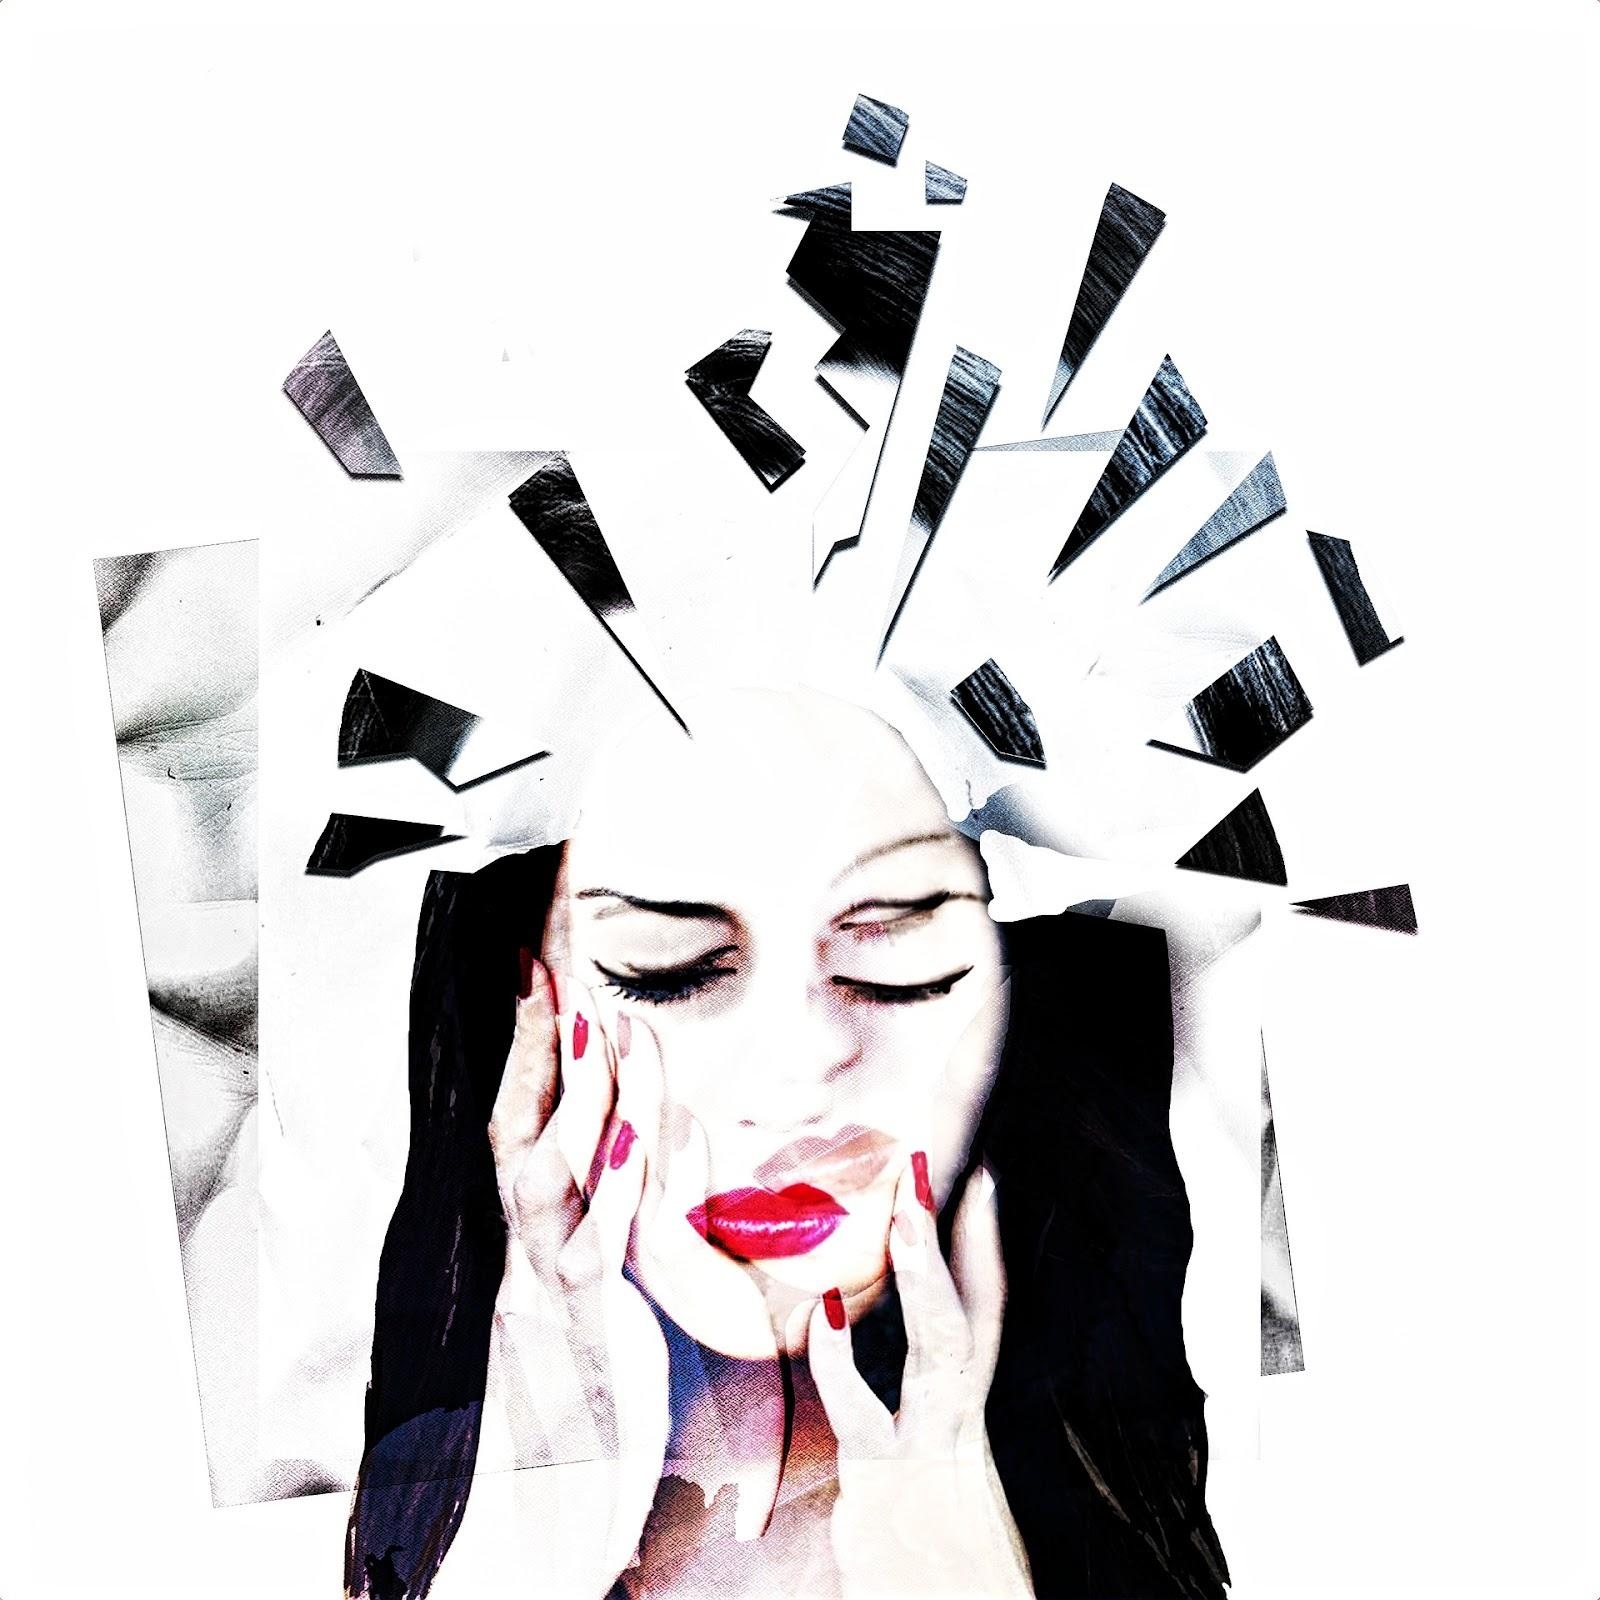 mental-health-1420801_1920.jpg